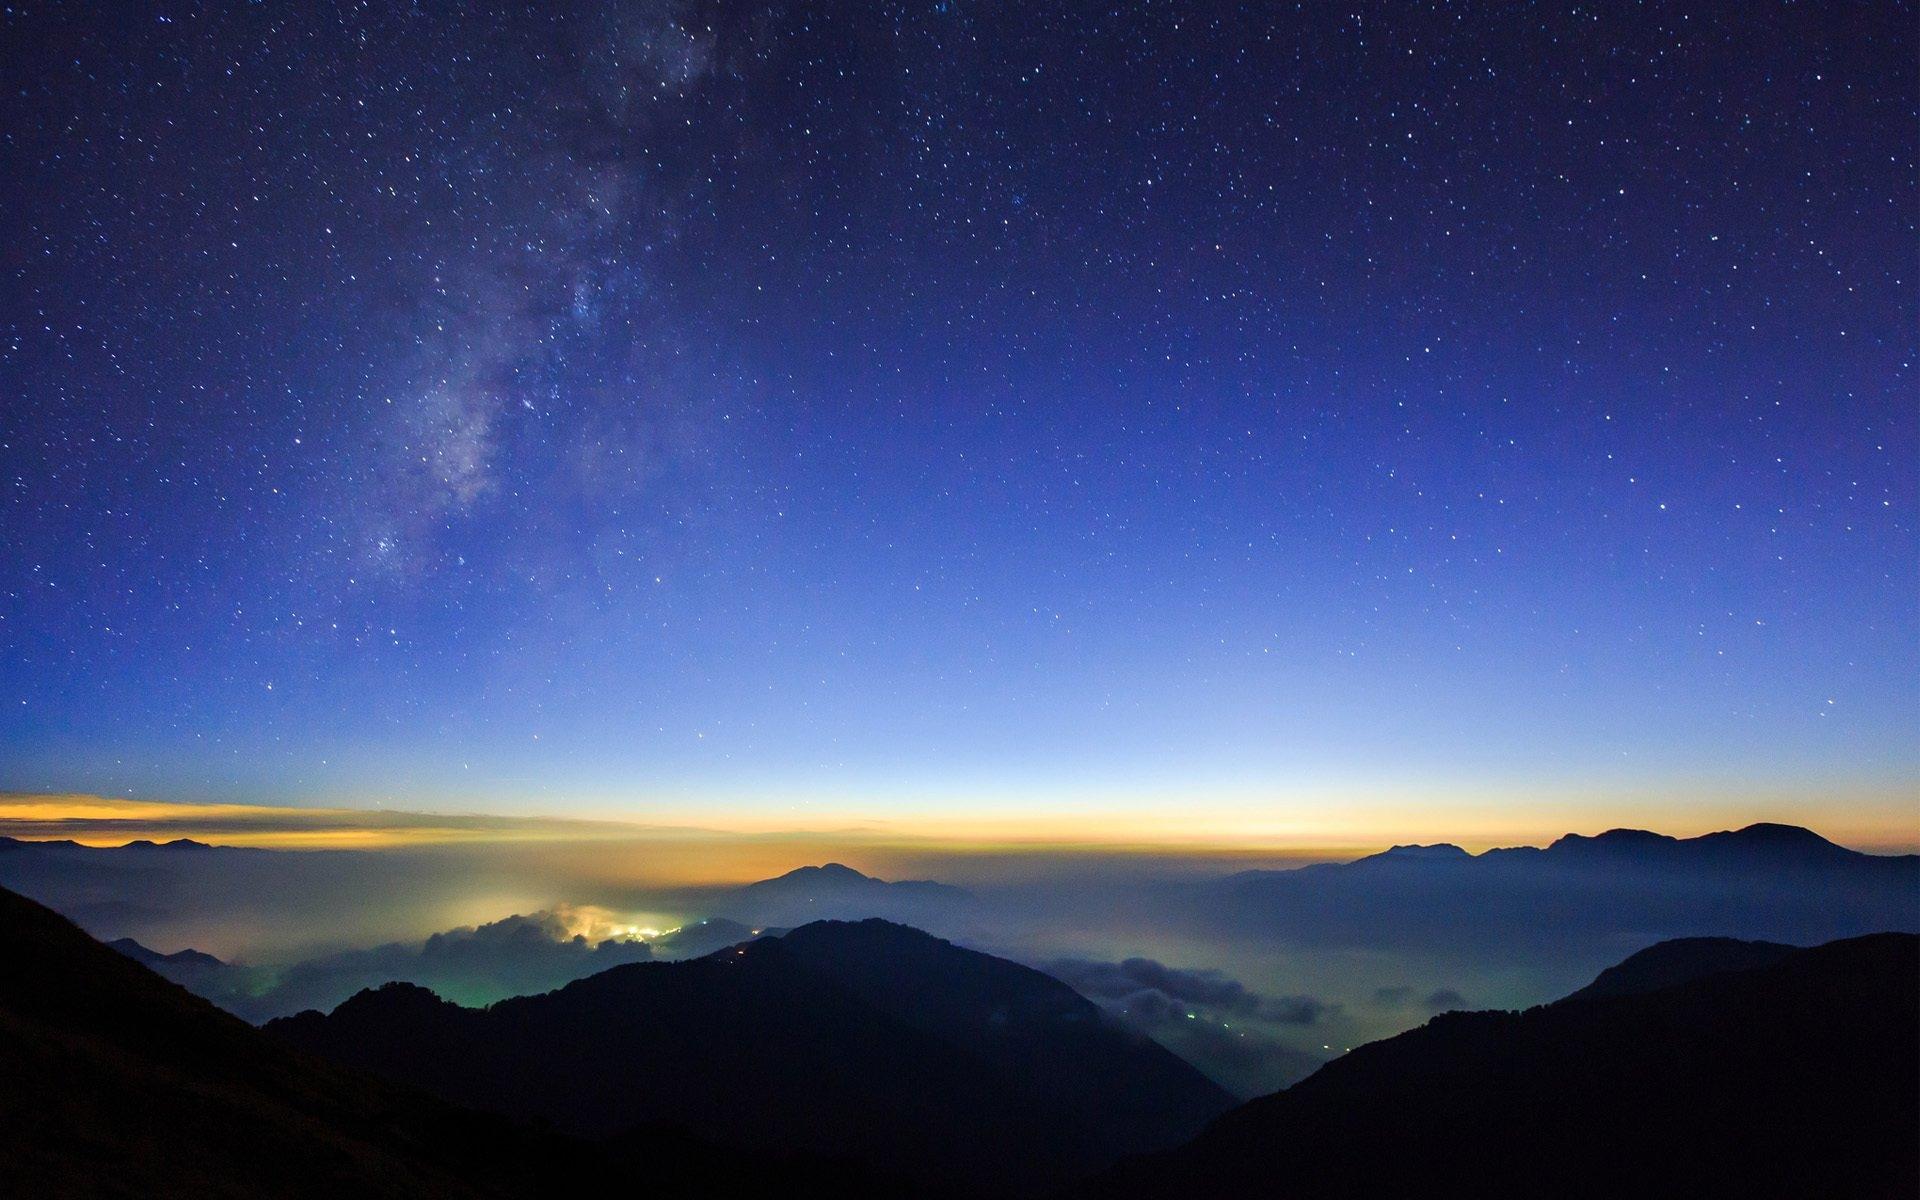 Звездное небо   картинки на рабочий стол телефона (21)